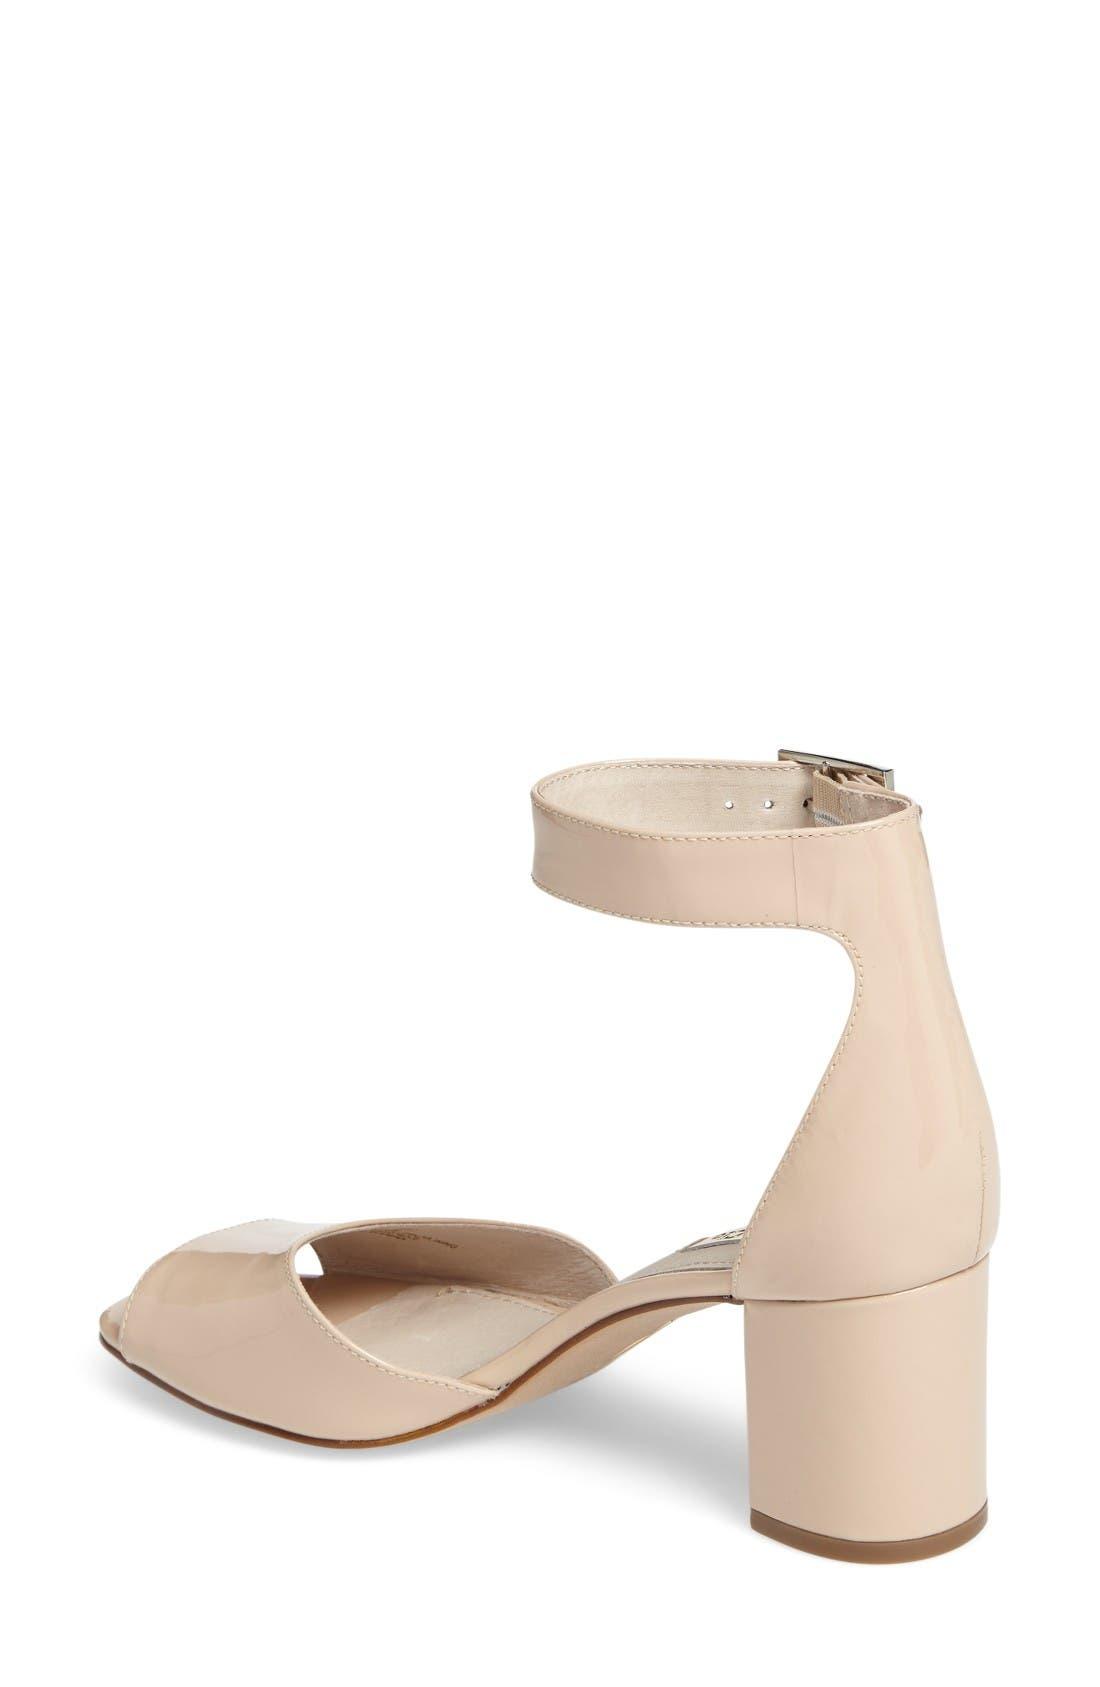 Karisa Ankle Cuff Sandal,                             Alternate thumbnail 2, color,                             Angel Food Patent